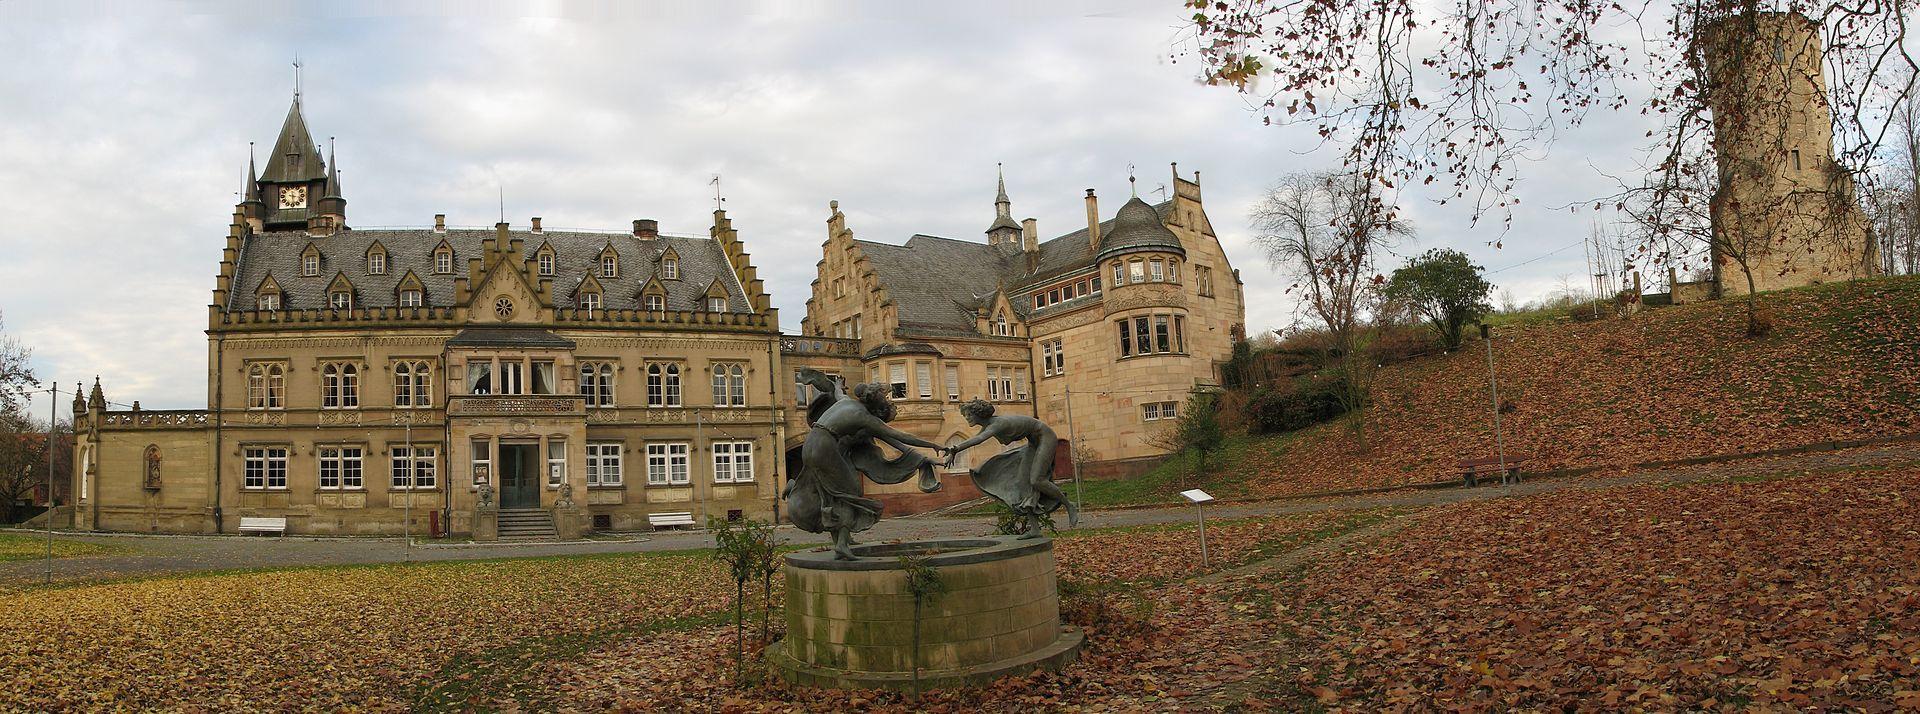 Post Gondelsheim